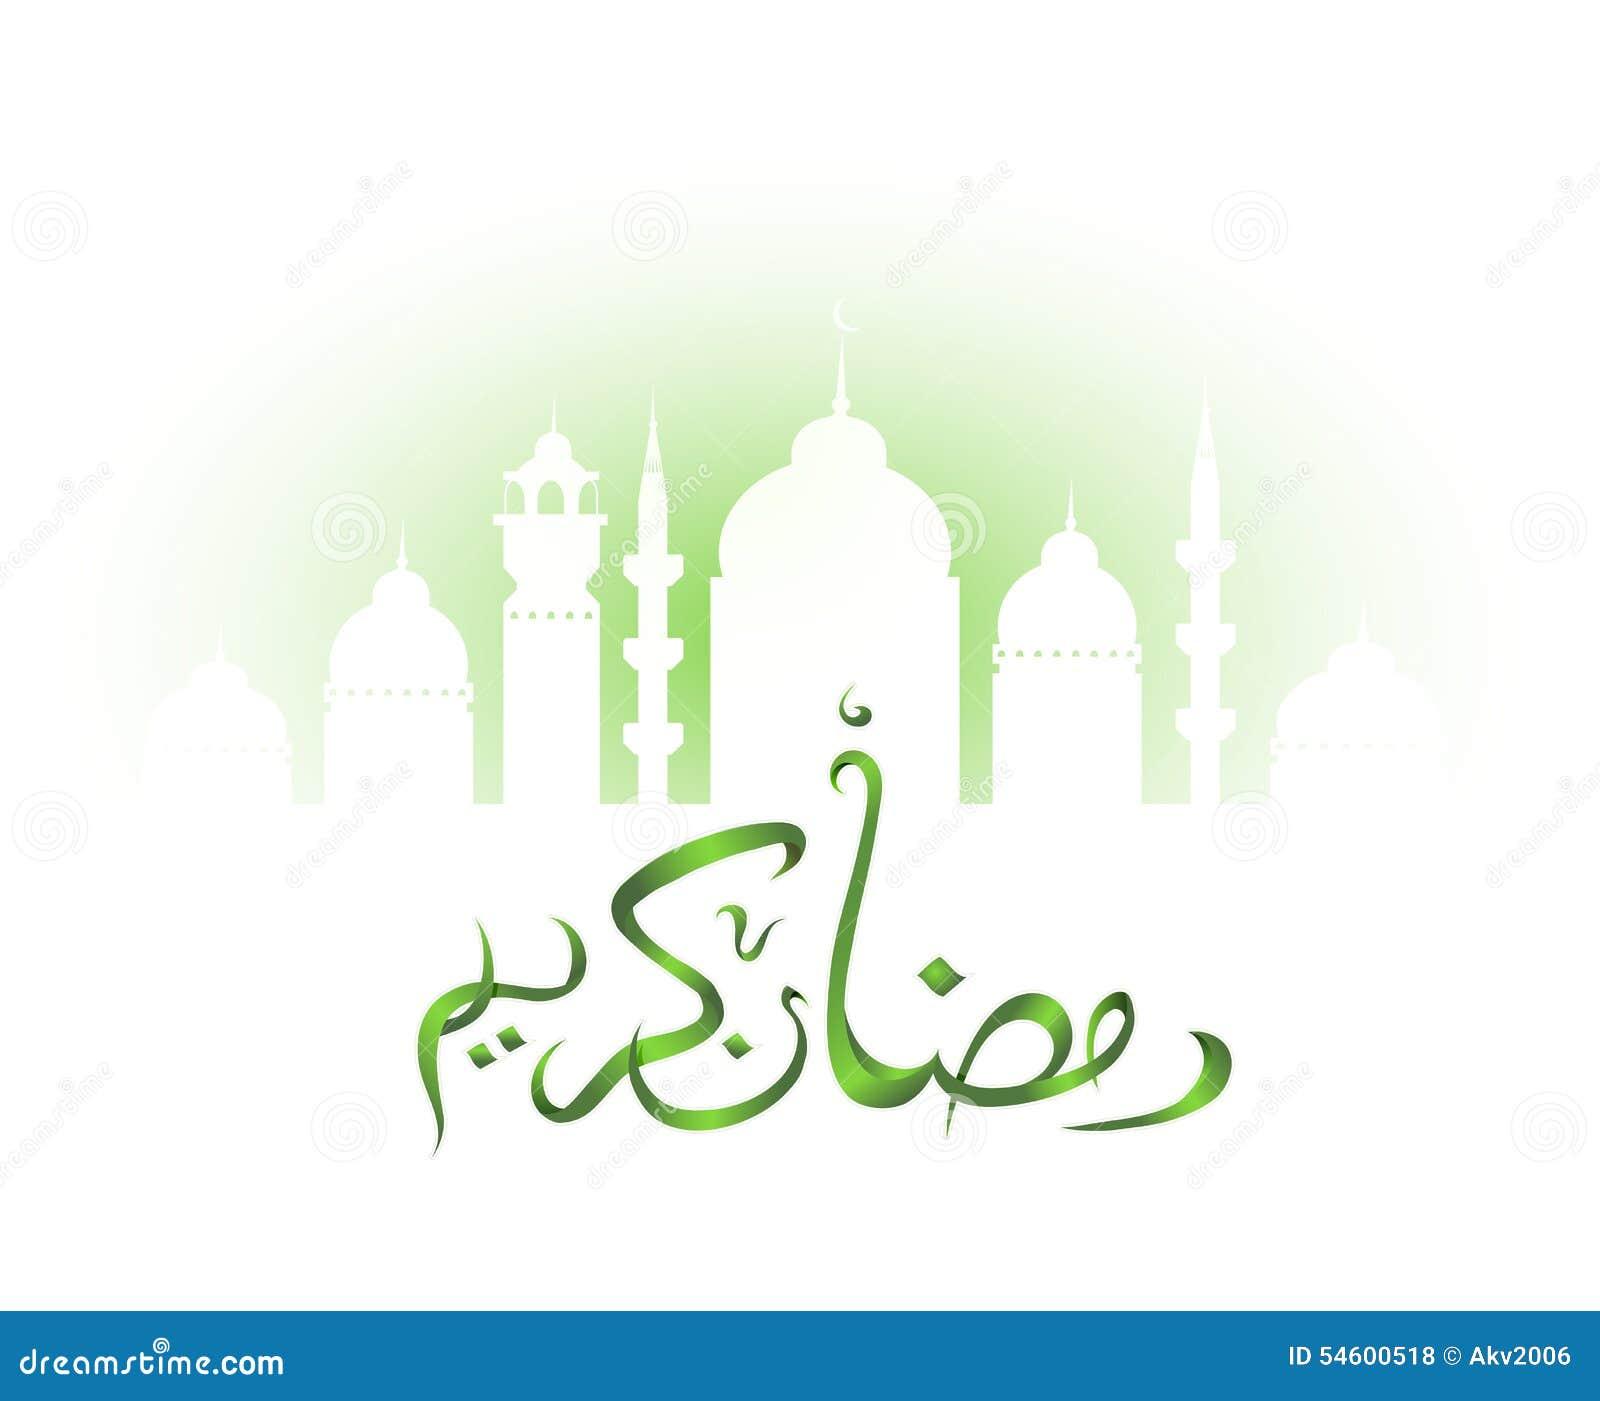 Ramadan greeting card design stock vector illustration of design ramadan greeting card design kristyandbryce Choice Image